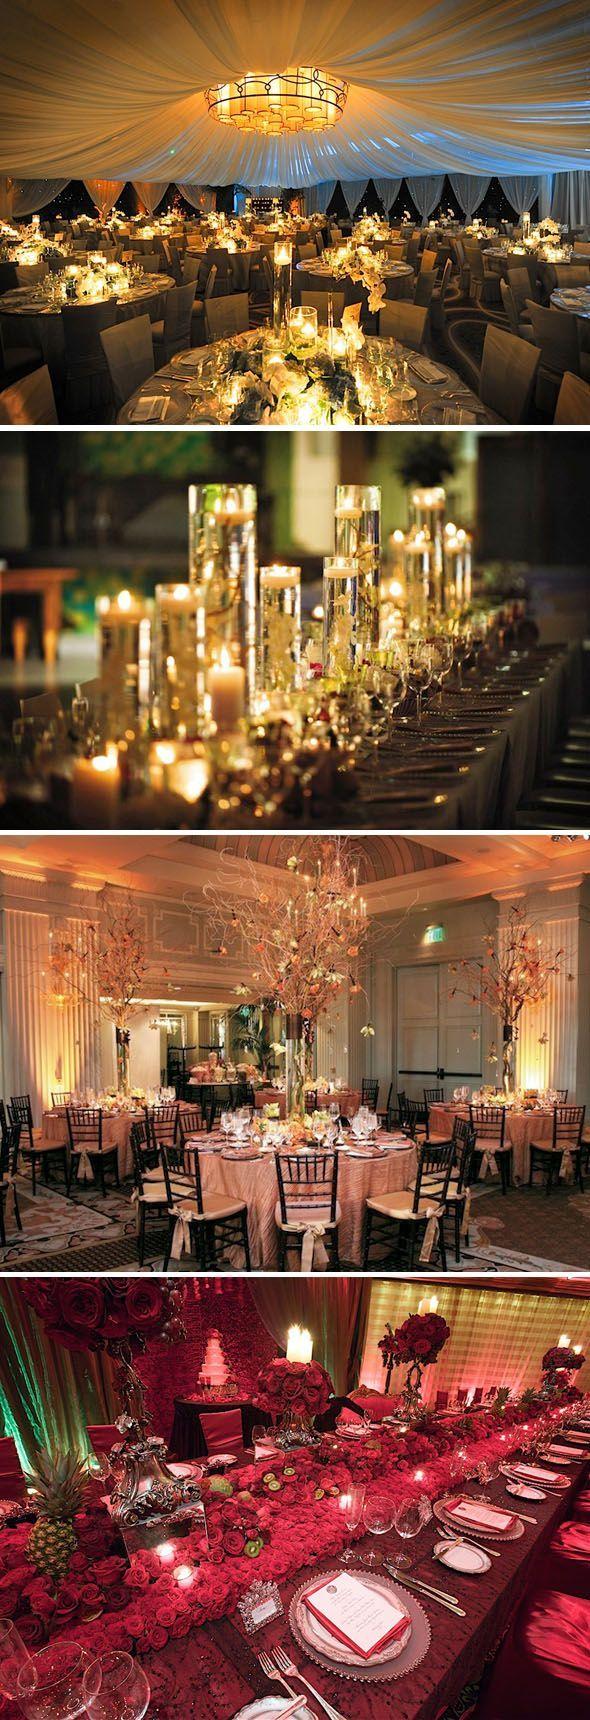 Salones para bodas muy lujosos para inspirarte decoracion de bodas salones boda salones - Salones lujosos ...